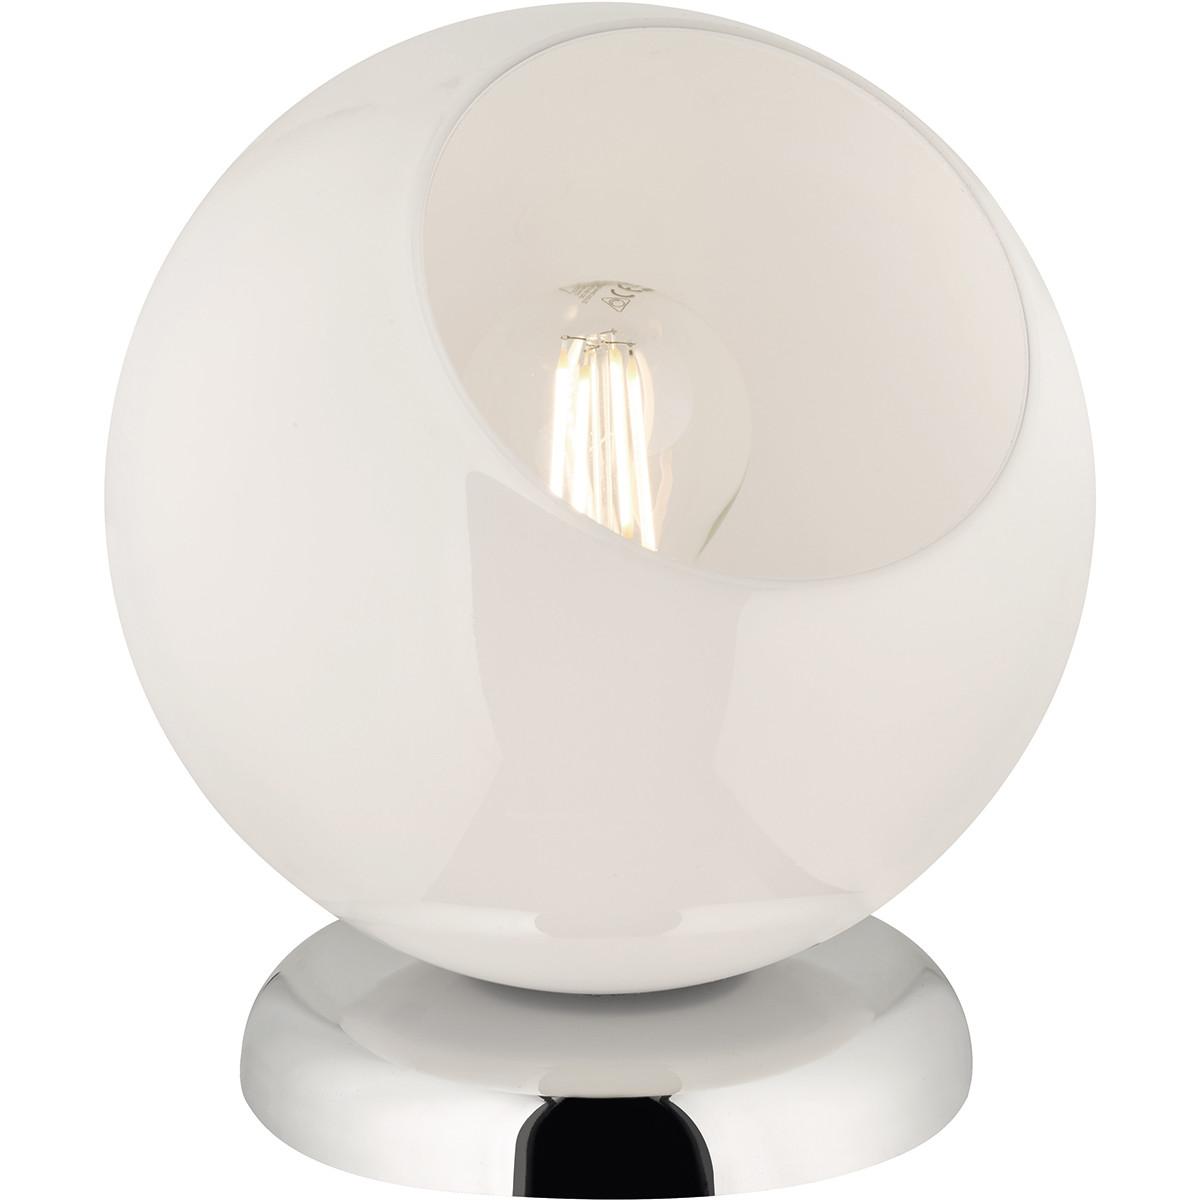 LED Tafellamp - Tafelverlichting - Trion Klino - E27 Fitting - Rond - Mat Chroom